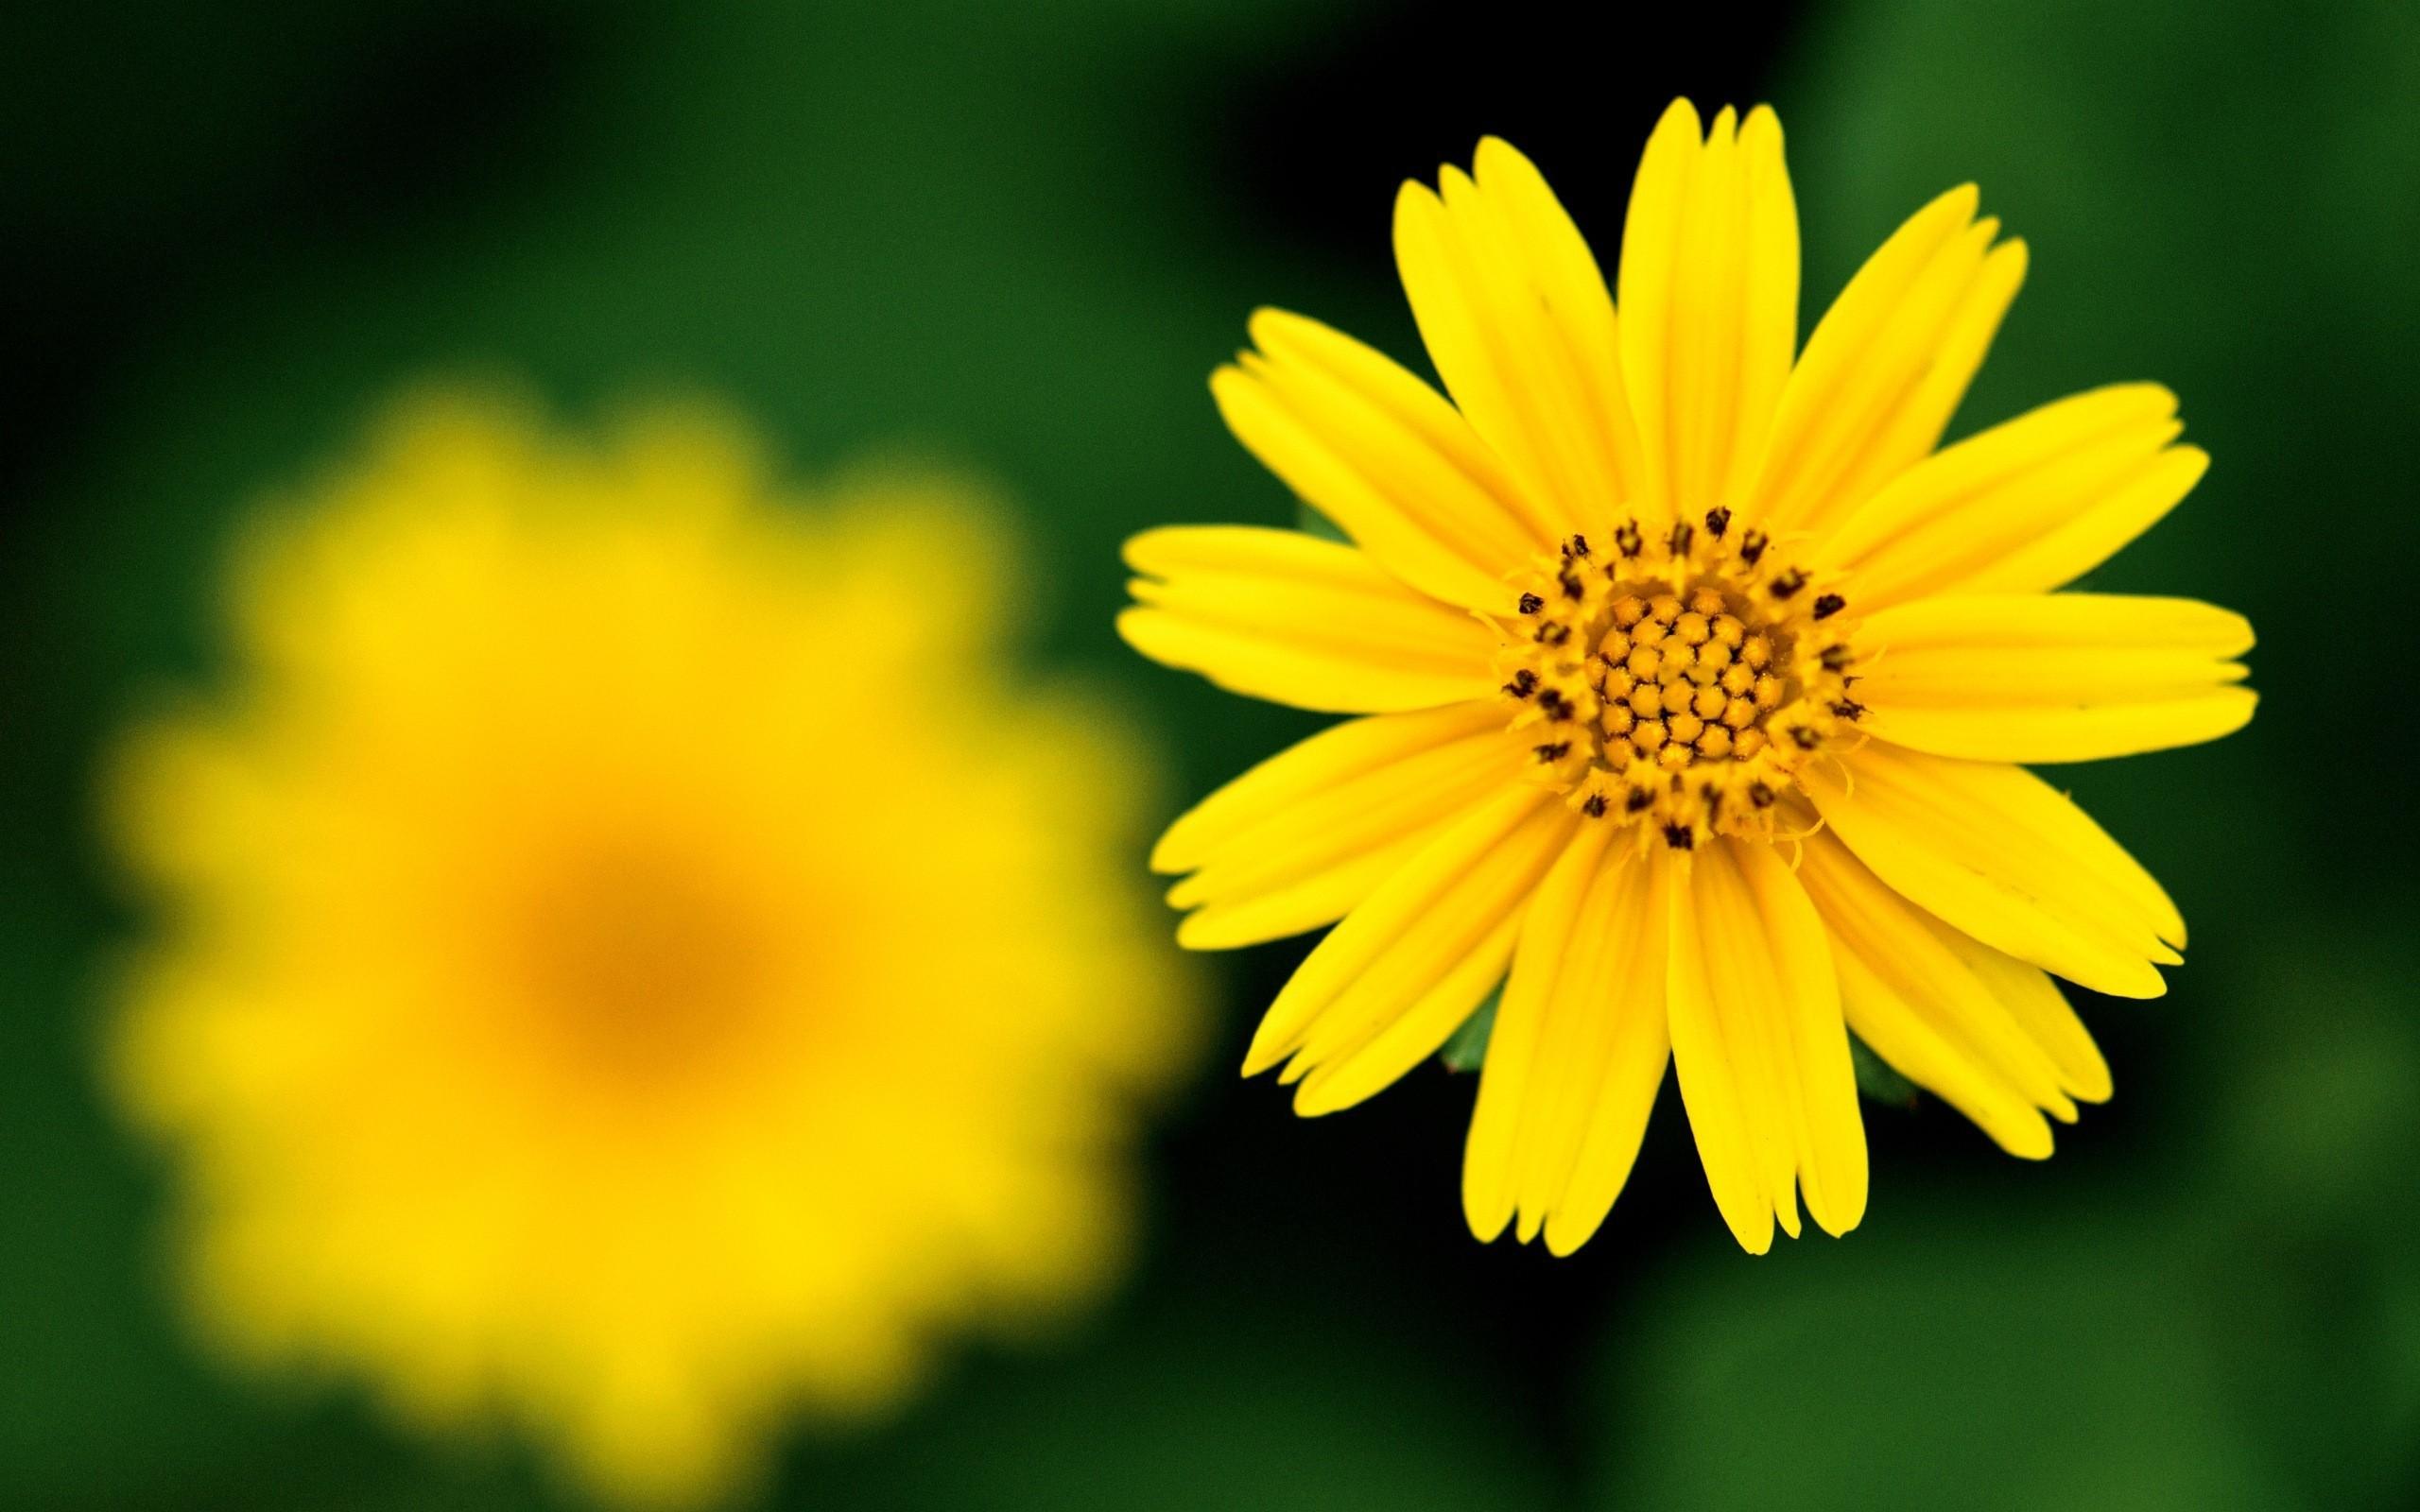 Flor amarilla - 2560x1600